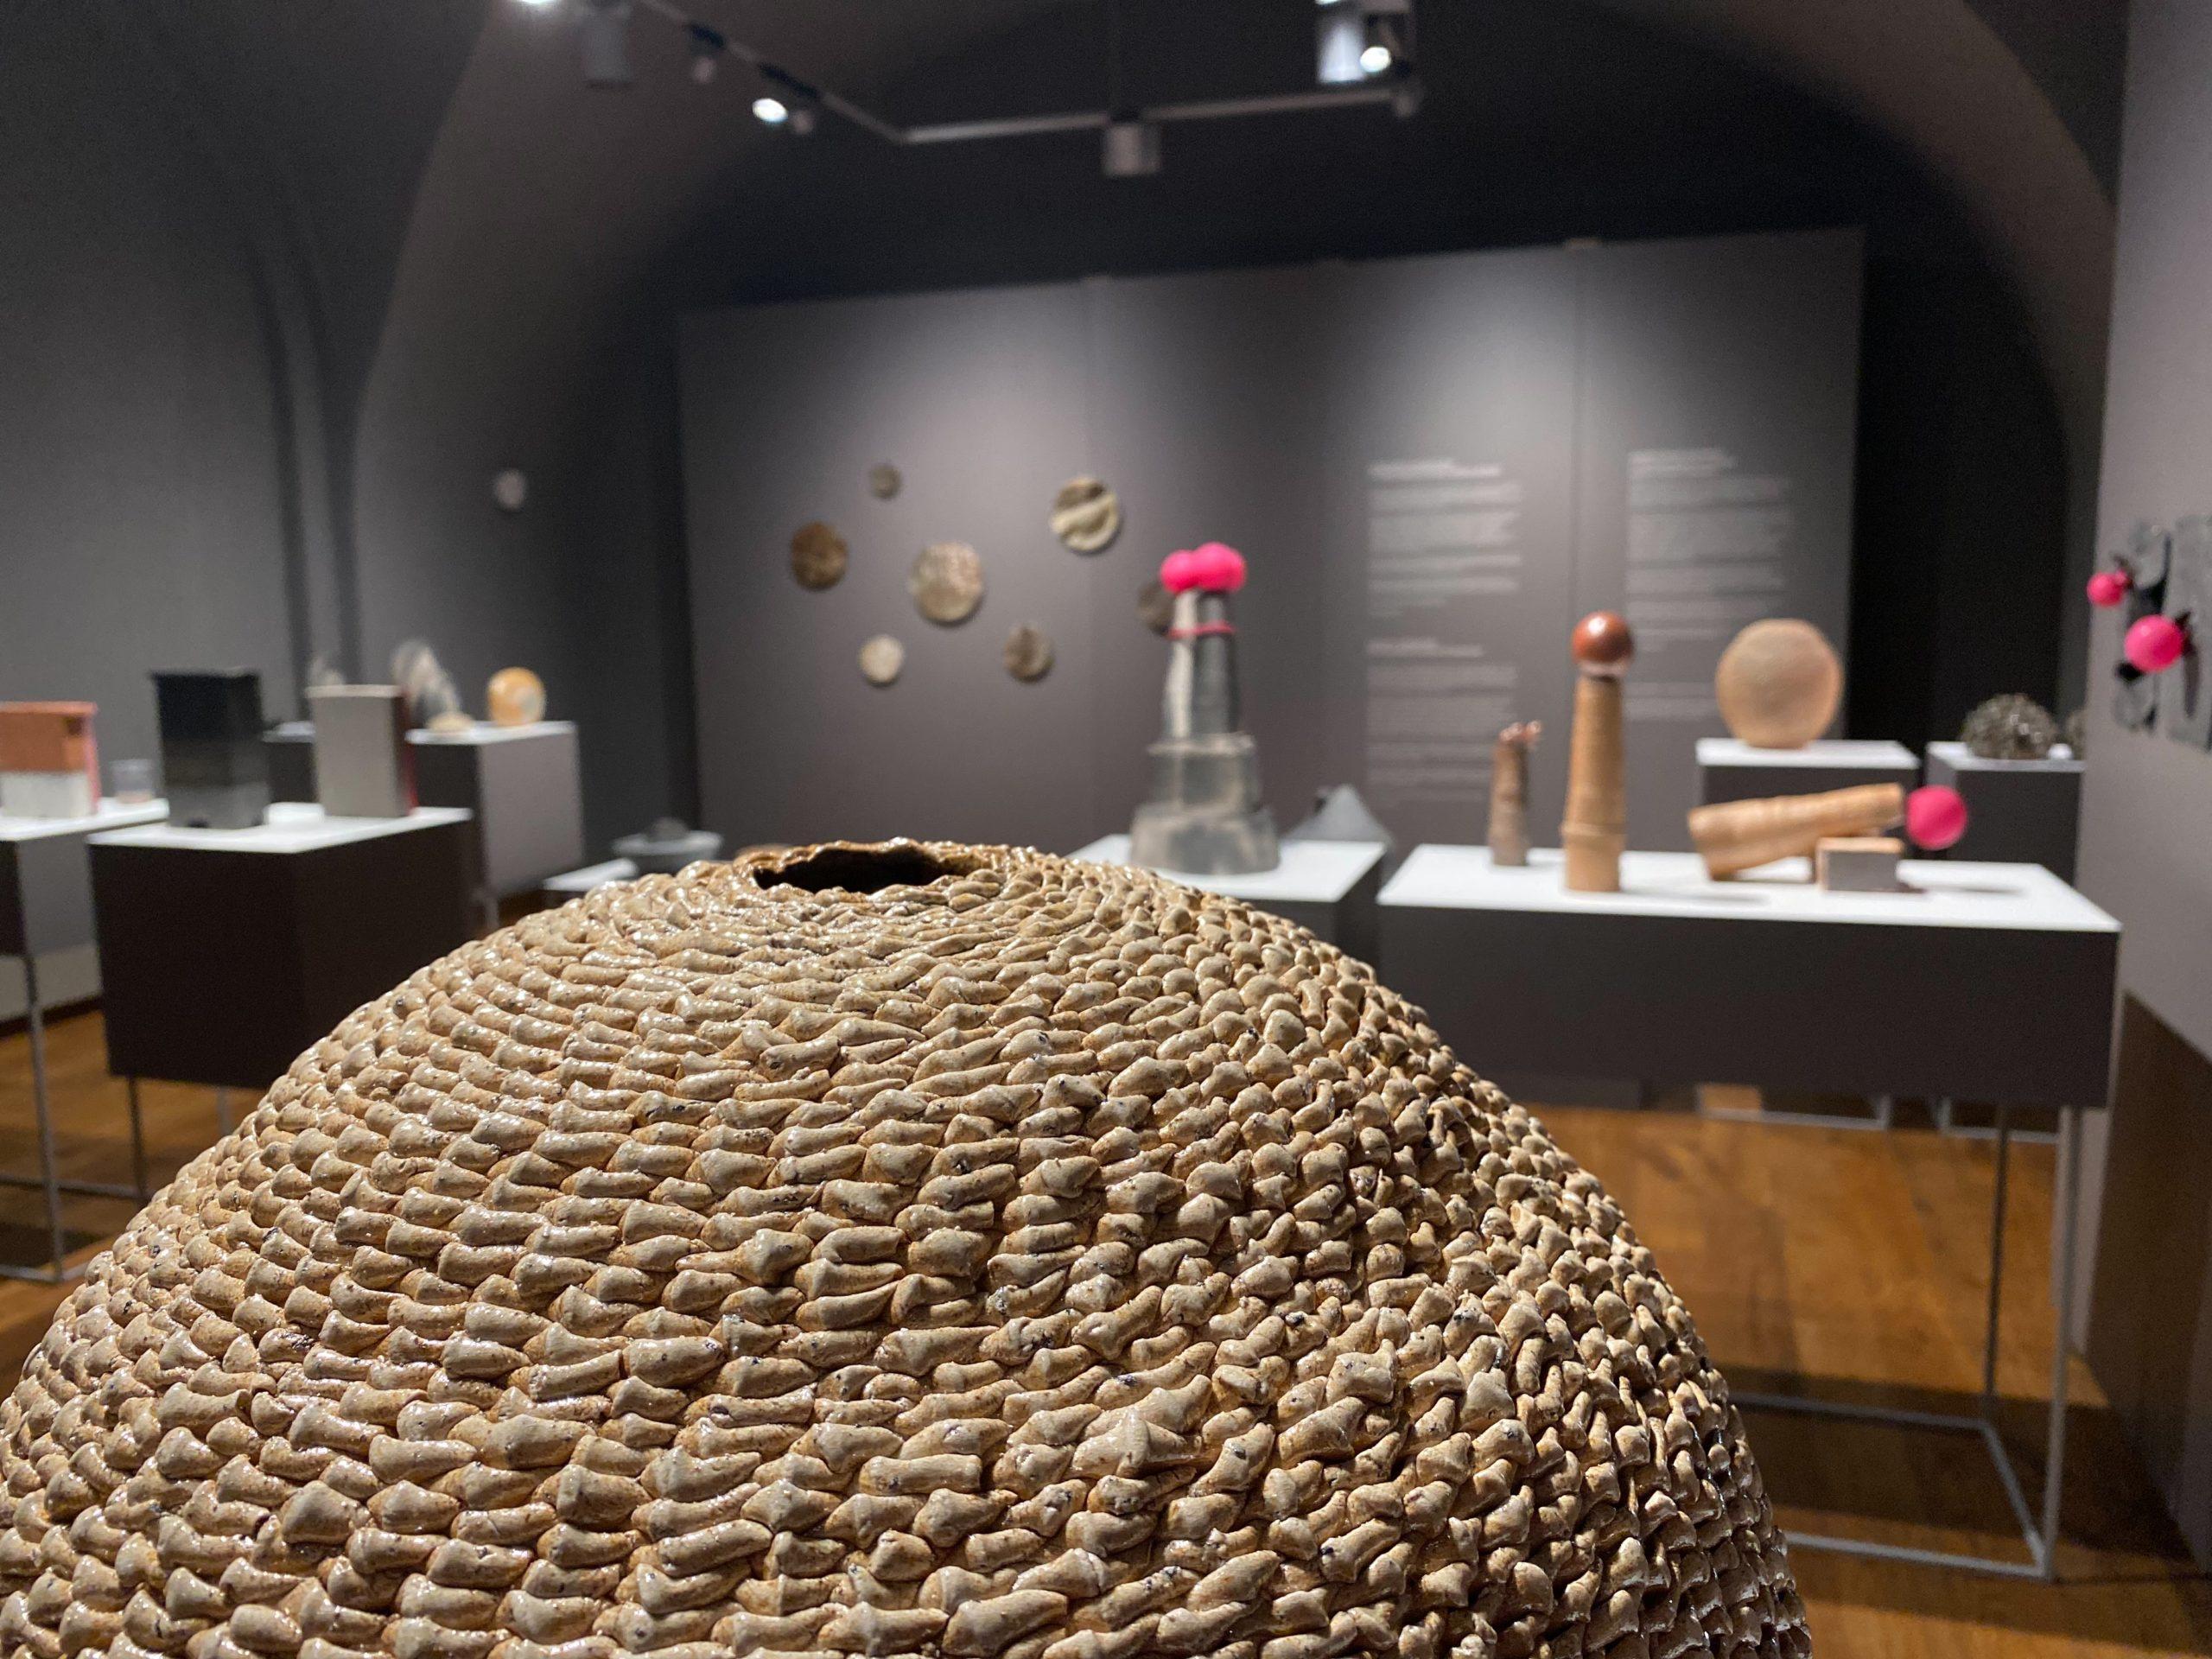 Keramikas Laboratorija